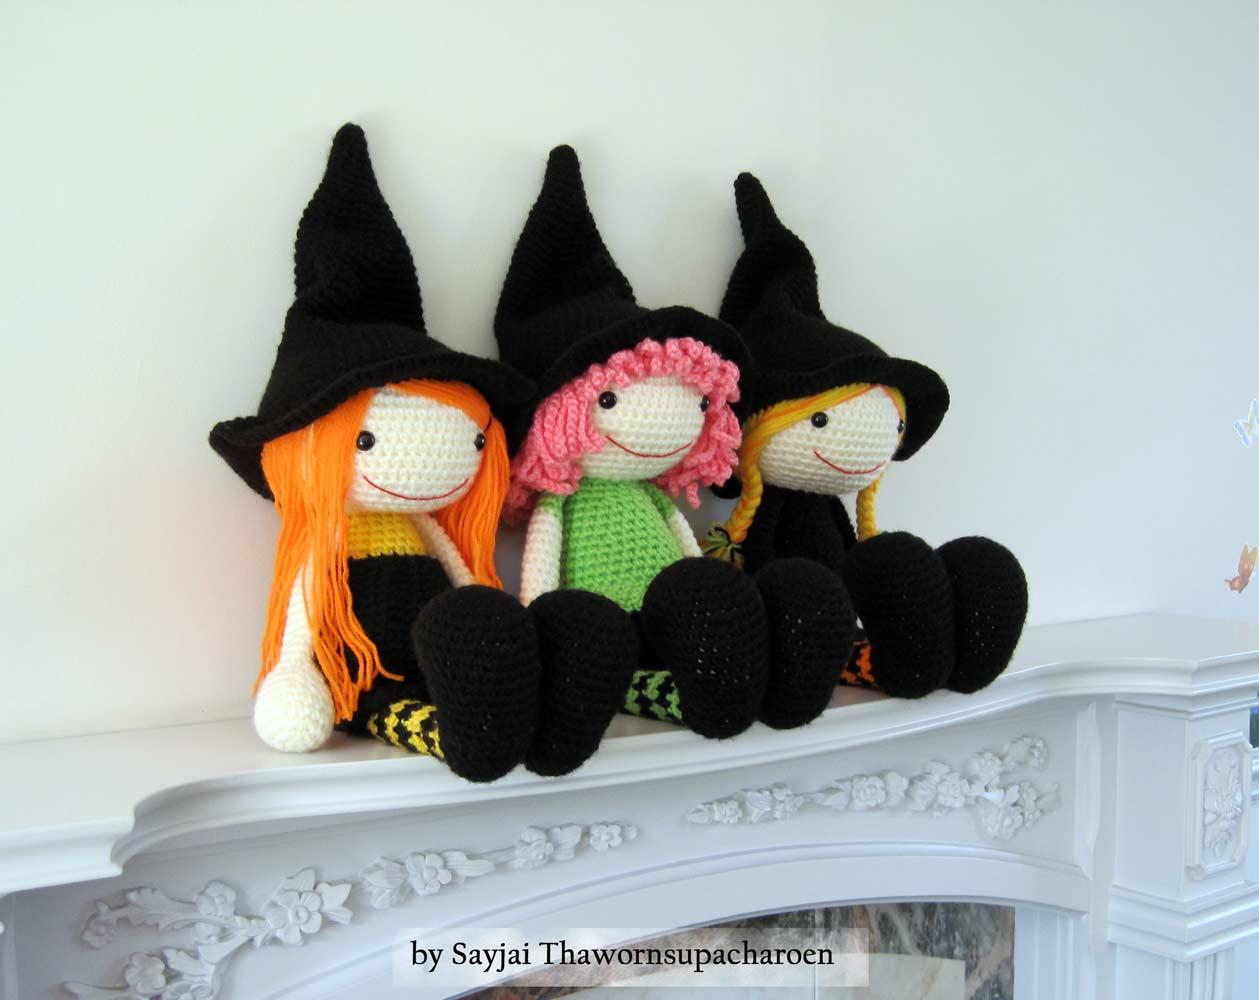 3 Witches crochet pattern: now available as PDF - Sayjai Amigurumi ...